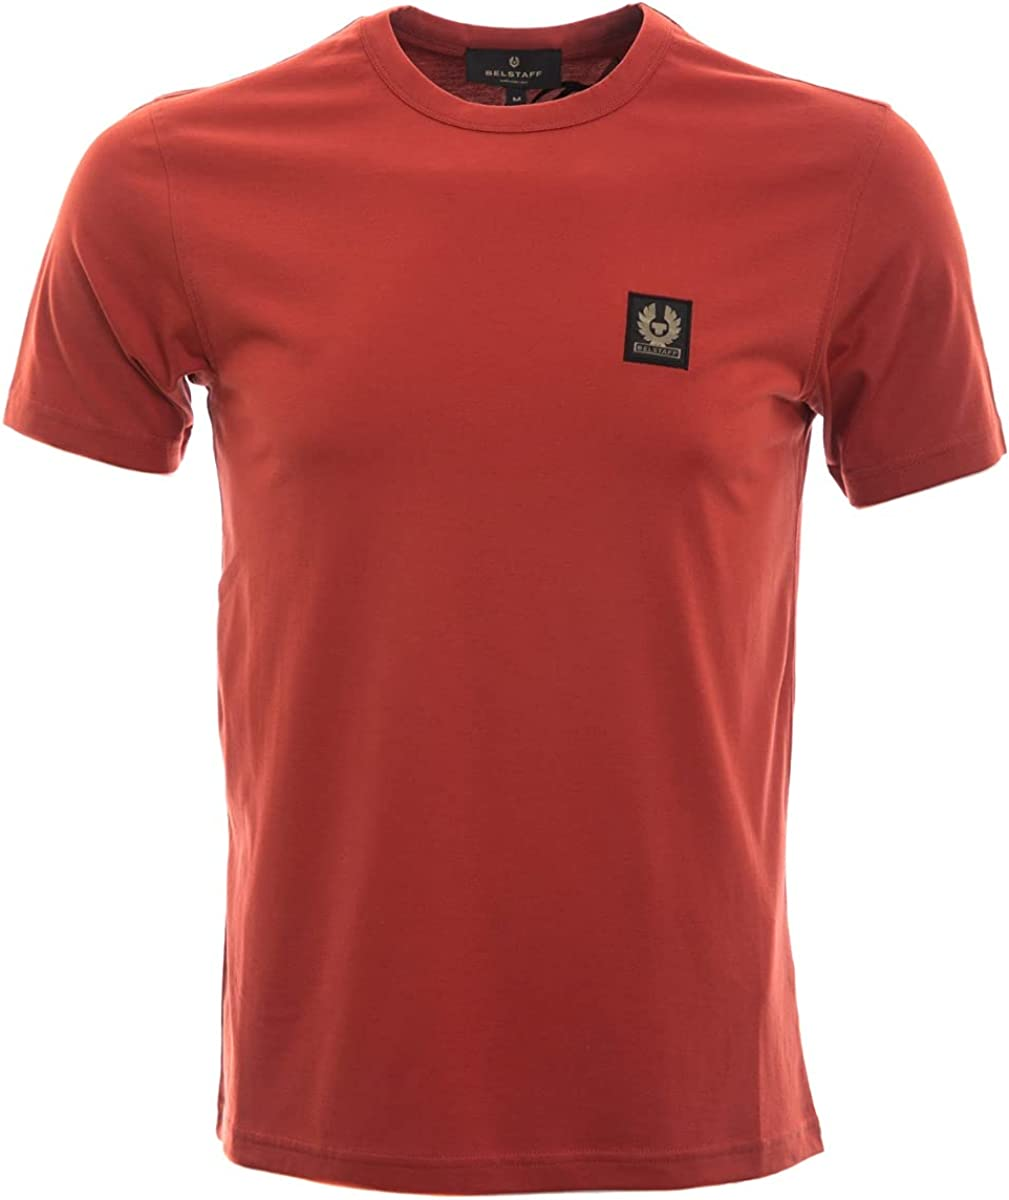 Belstaff New sales Classic Denver Mall T-Shirt in Red Ochre